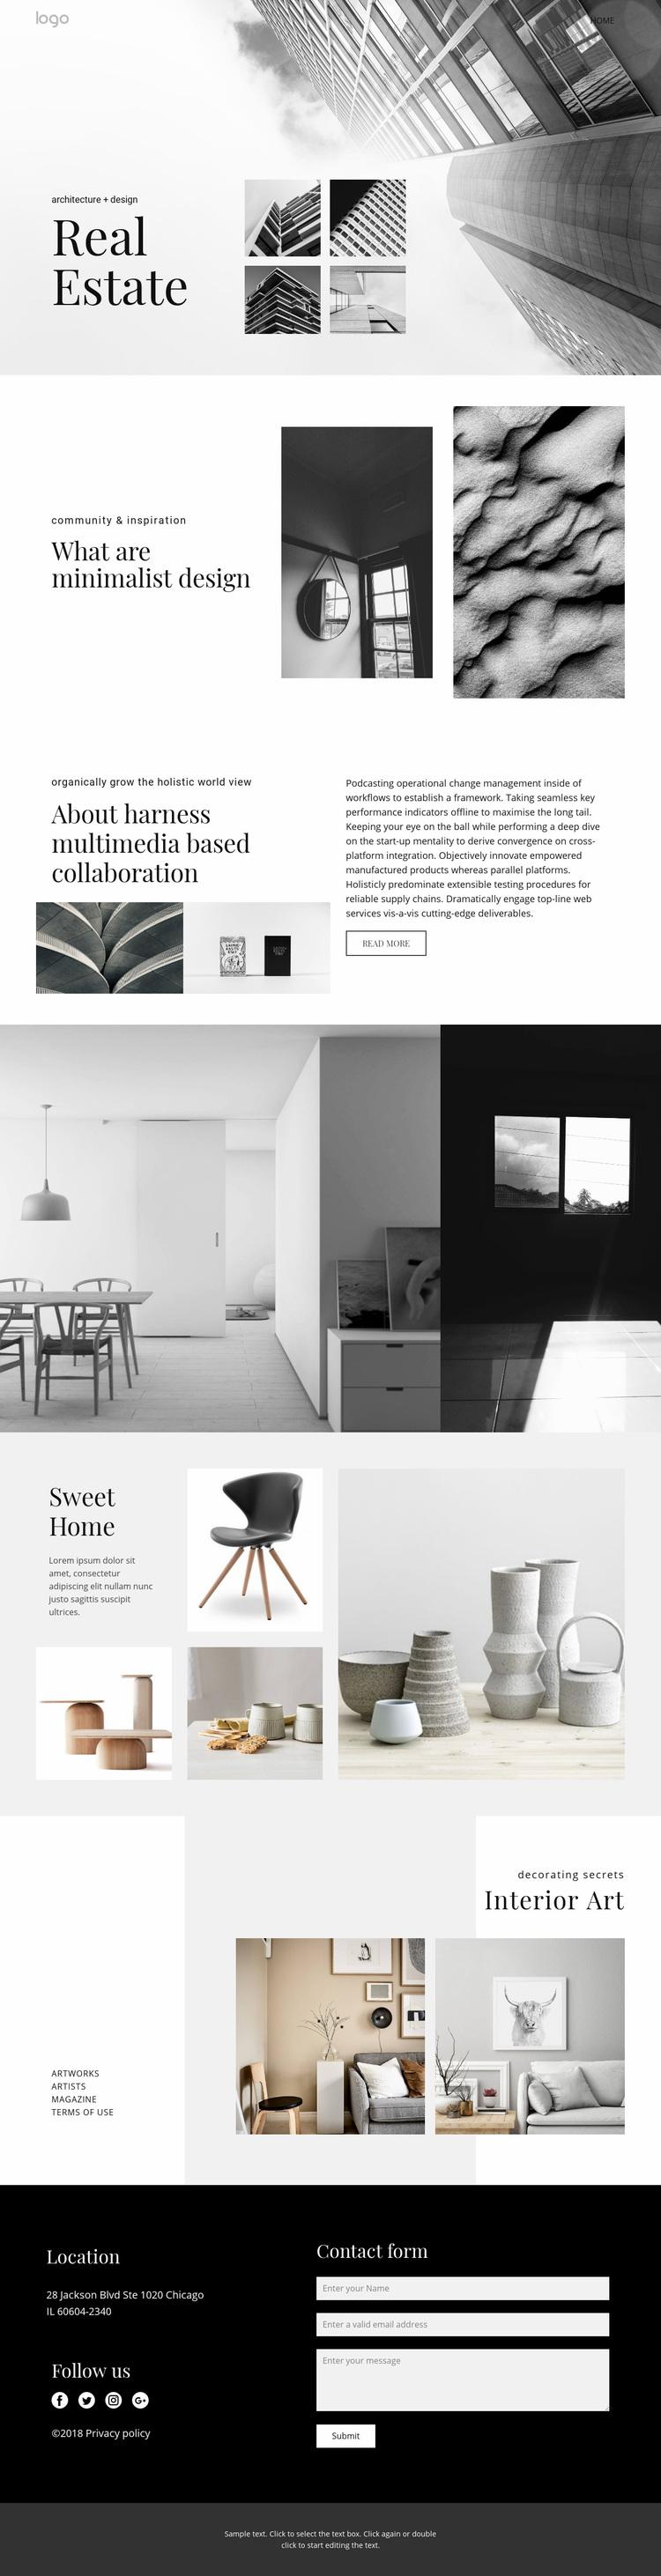 Real estate agency for people Web Page Designer